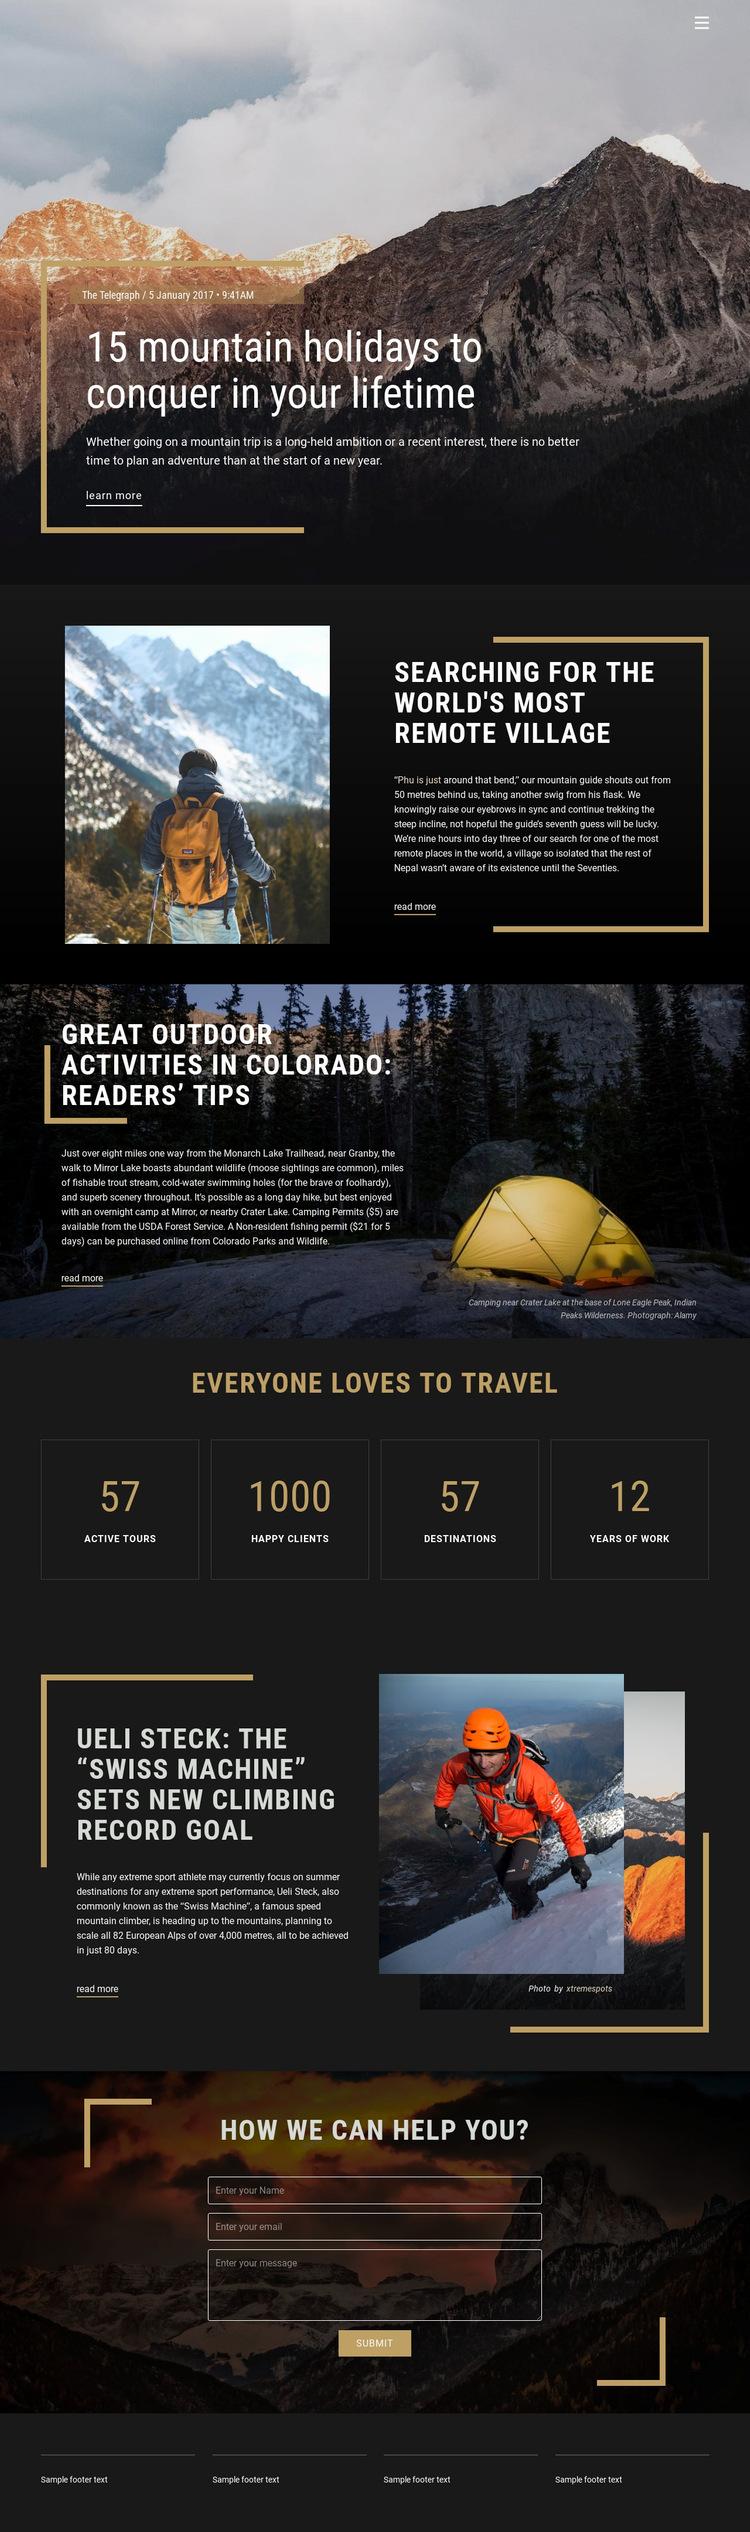 Mountain Holidays Web Page Design